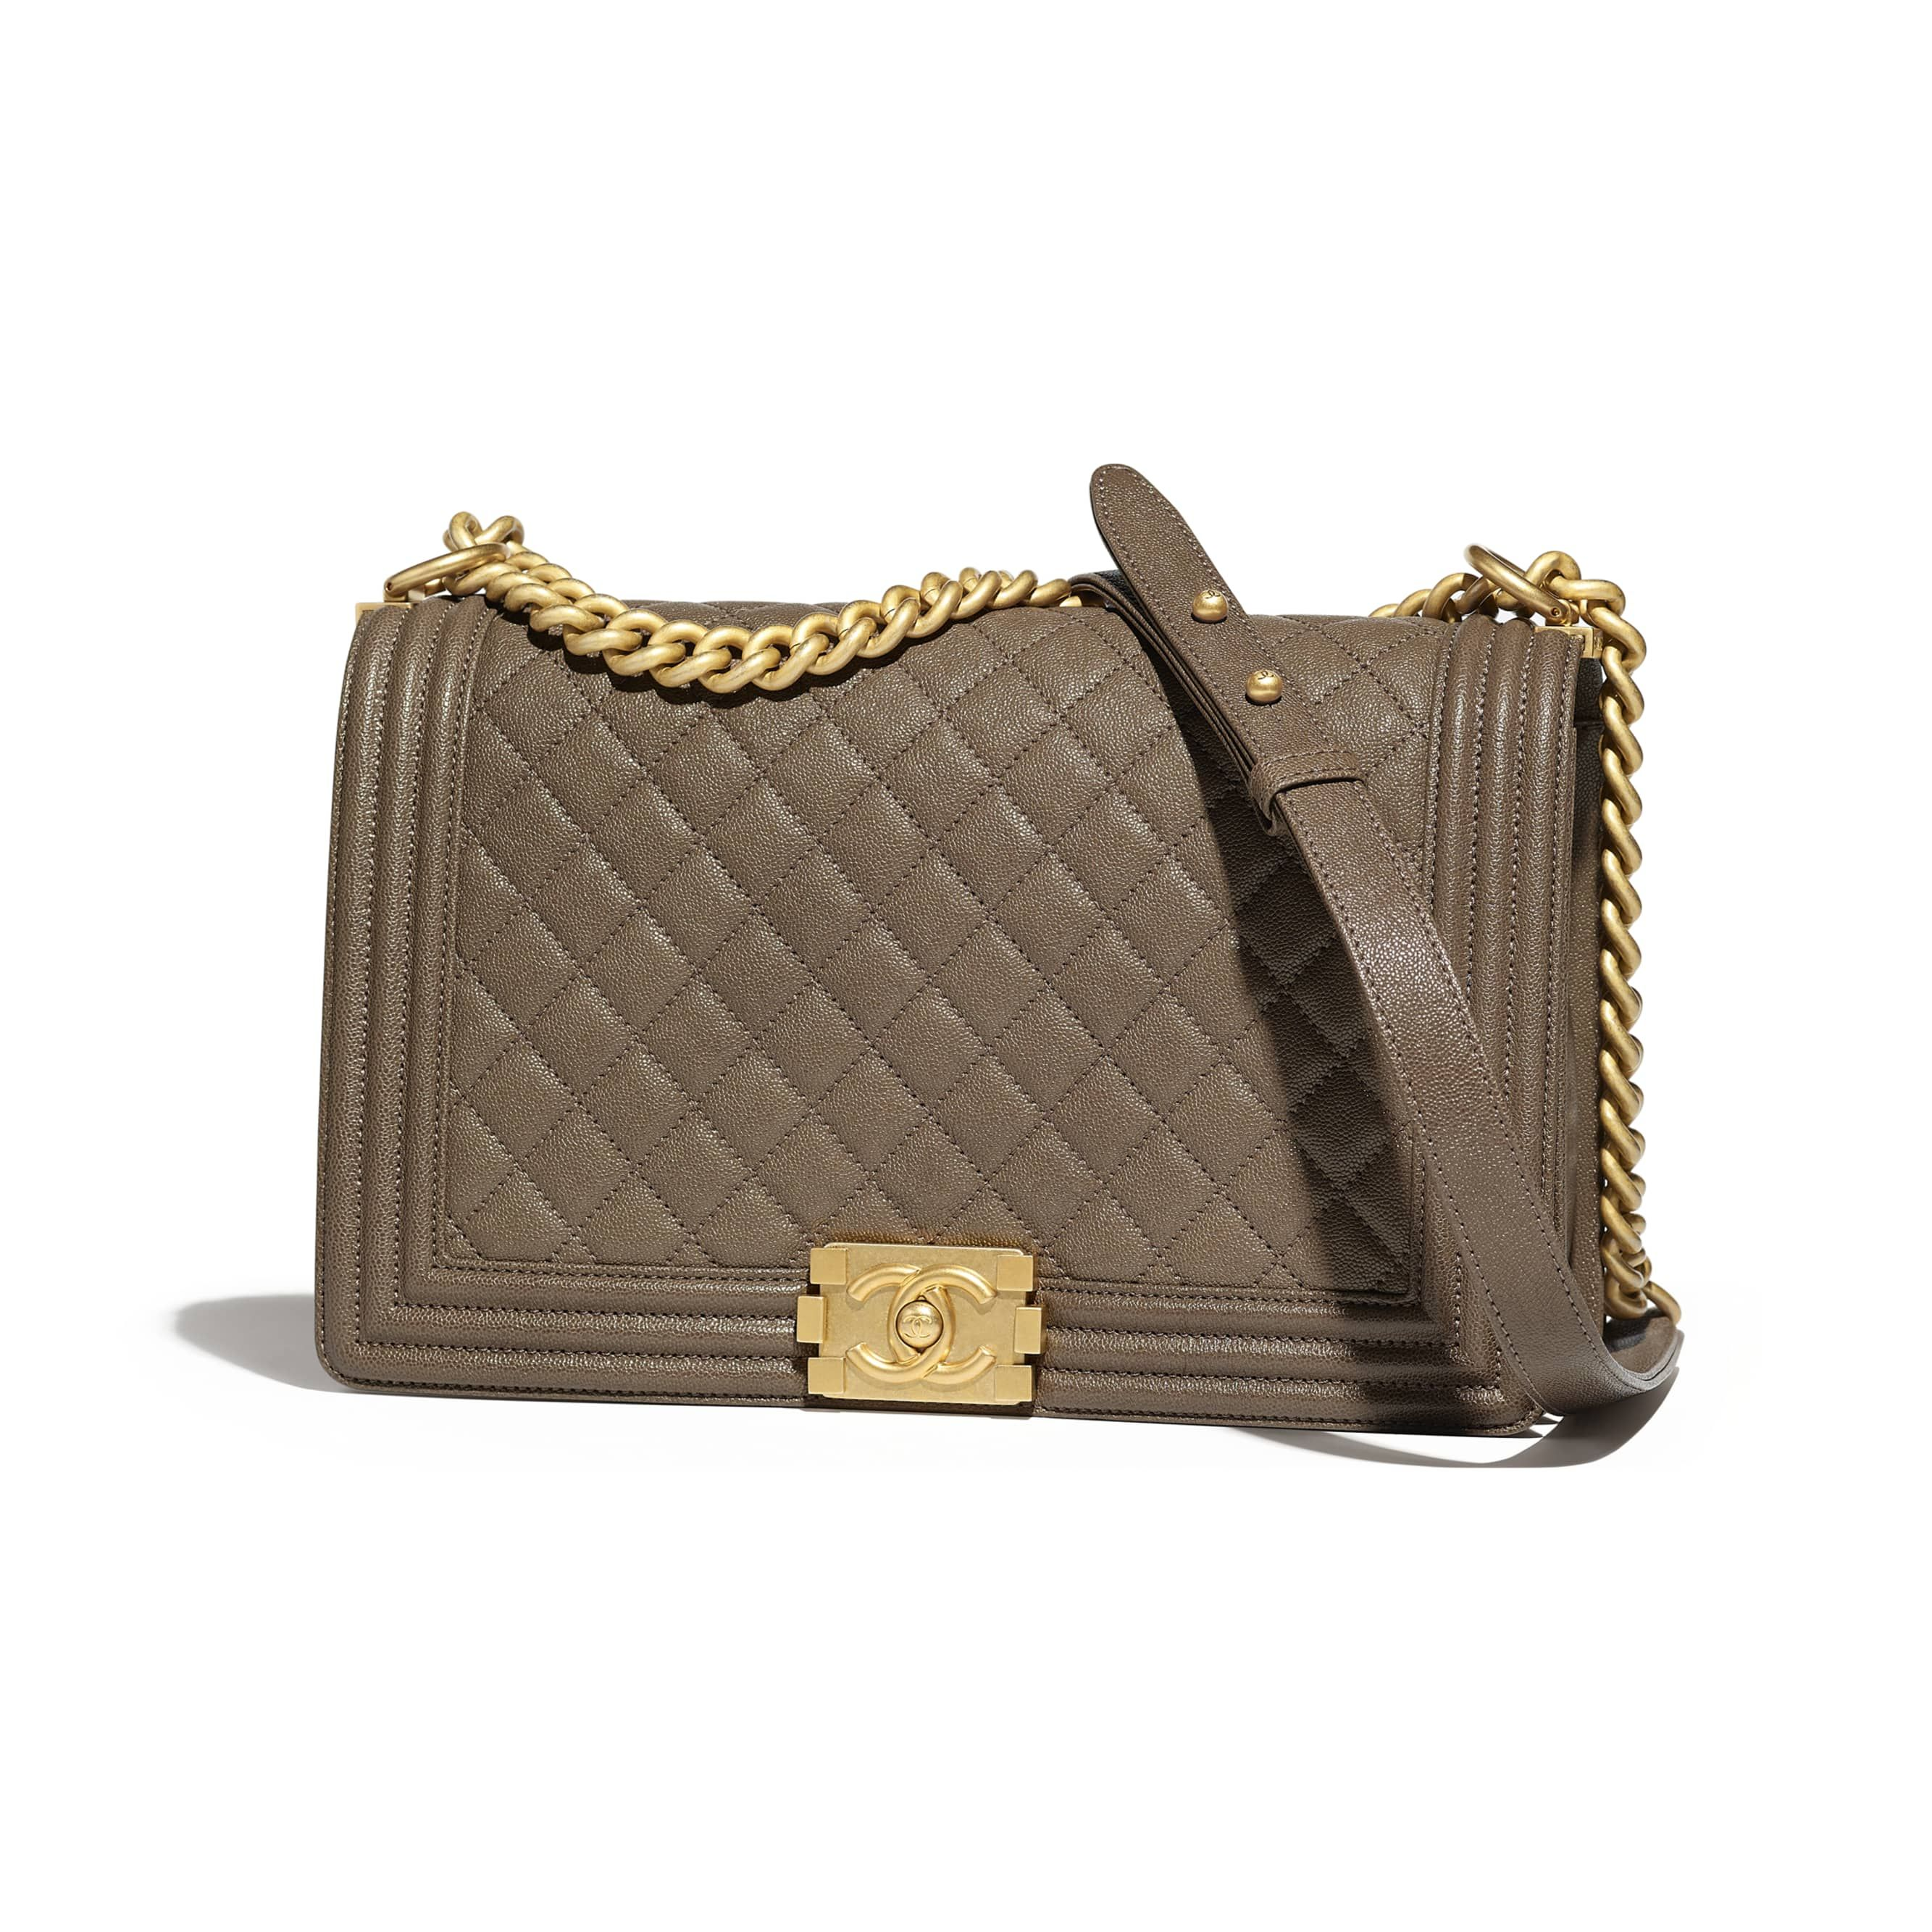 197b1d9fd9d1 Grained Calfskin & Gold-Tone Metal Khaki Large BOY CHANEL Handbag   CHANEL